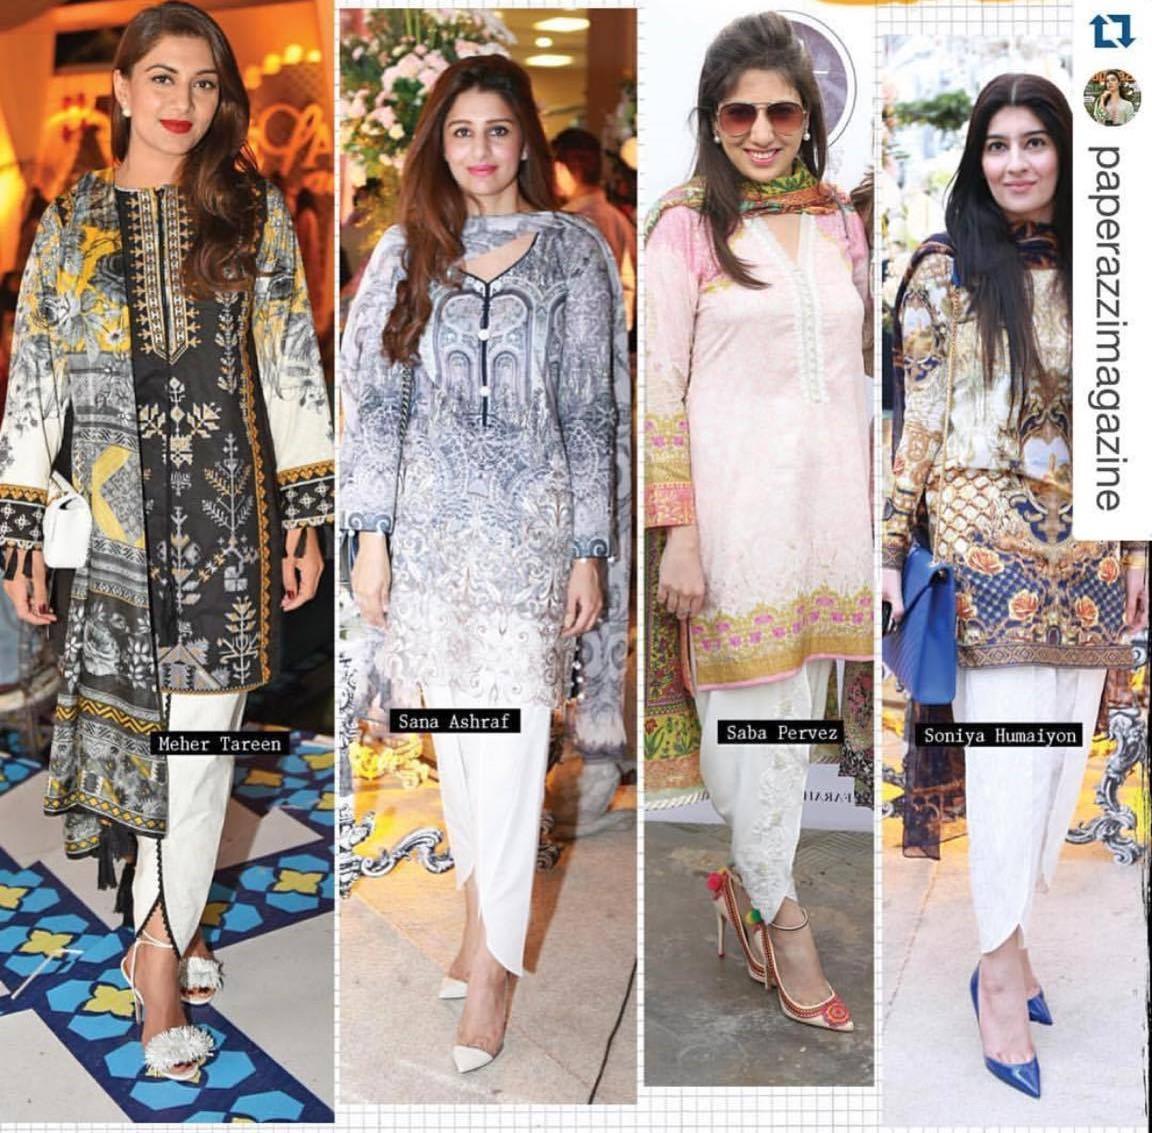 Top 8 Best Designers Tulip Shawar Designs For Girls 2016'17 (15)